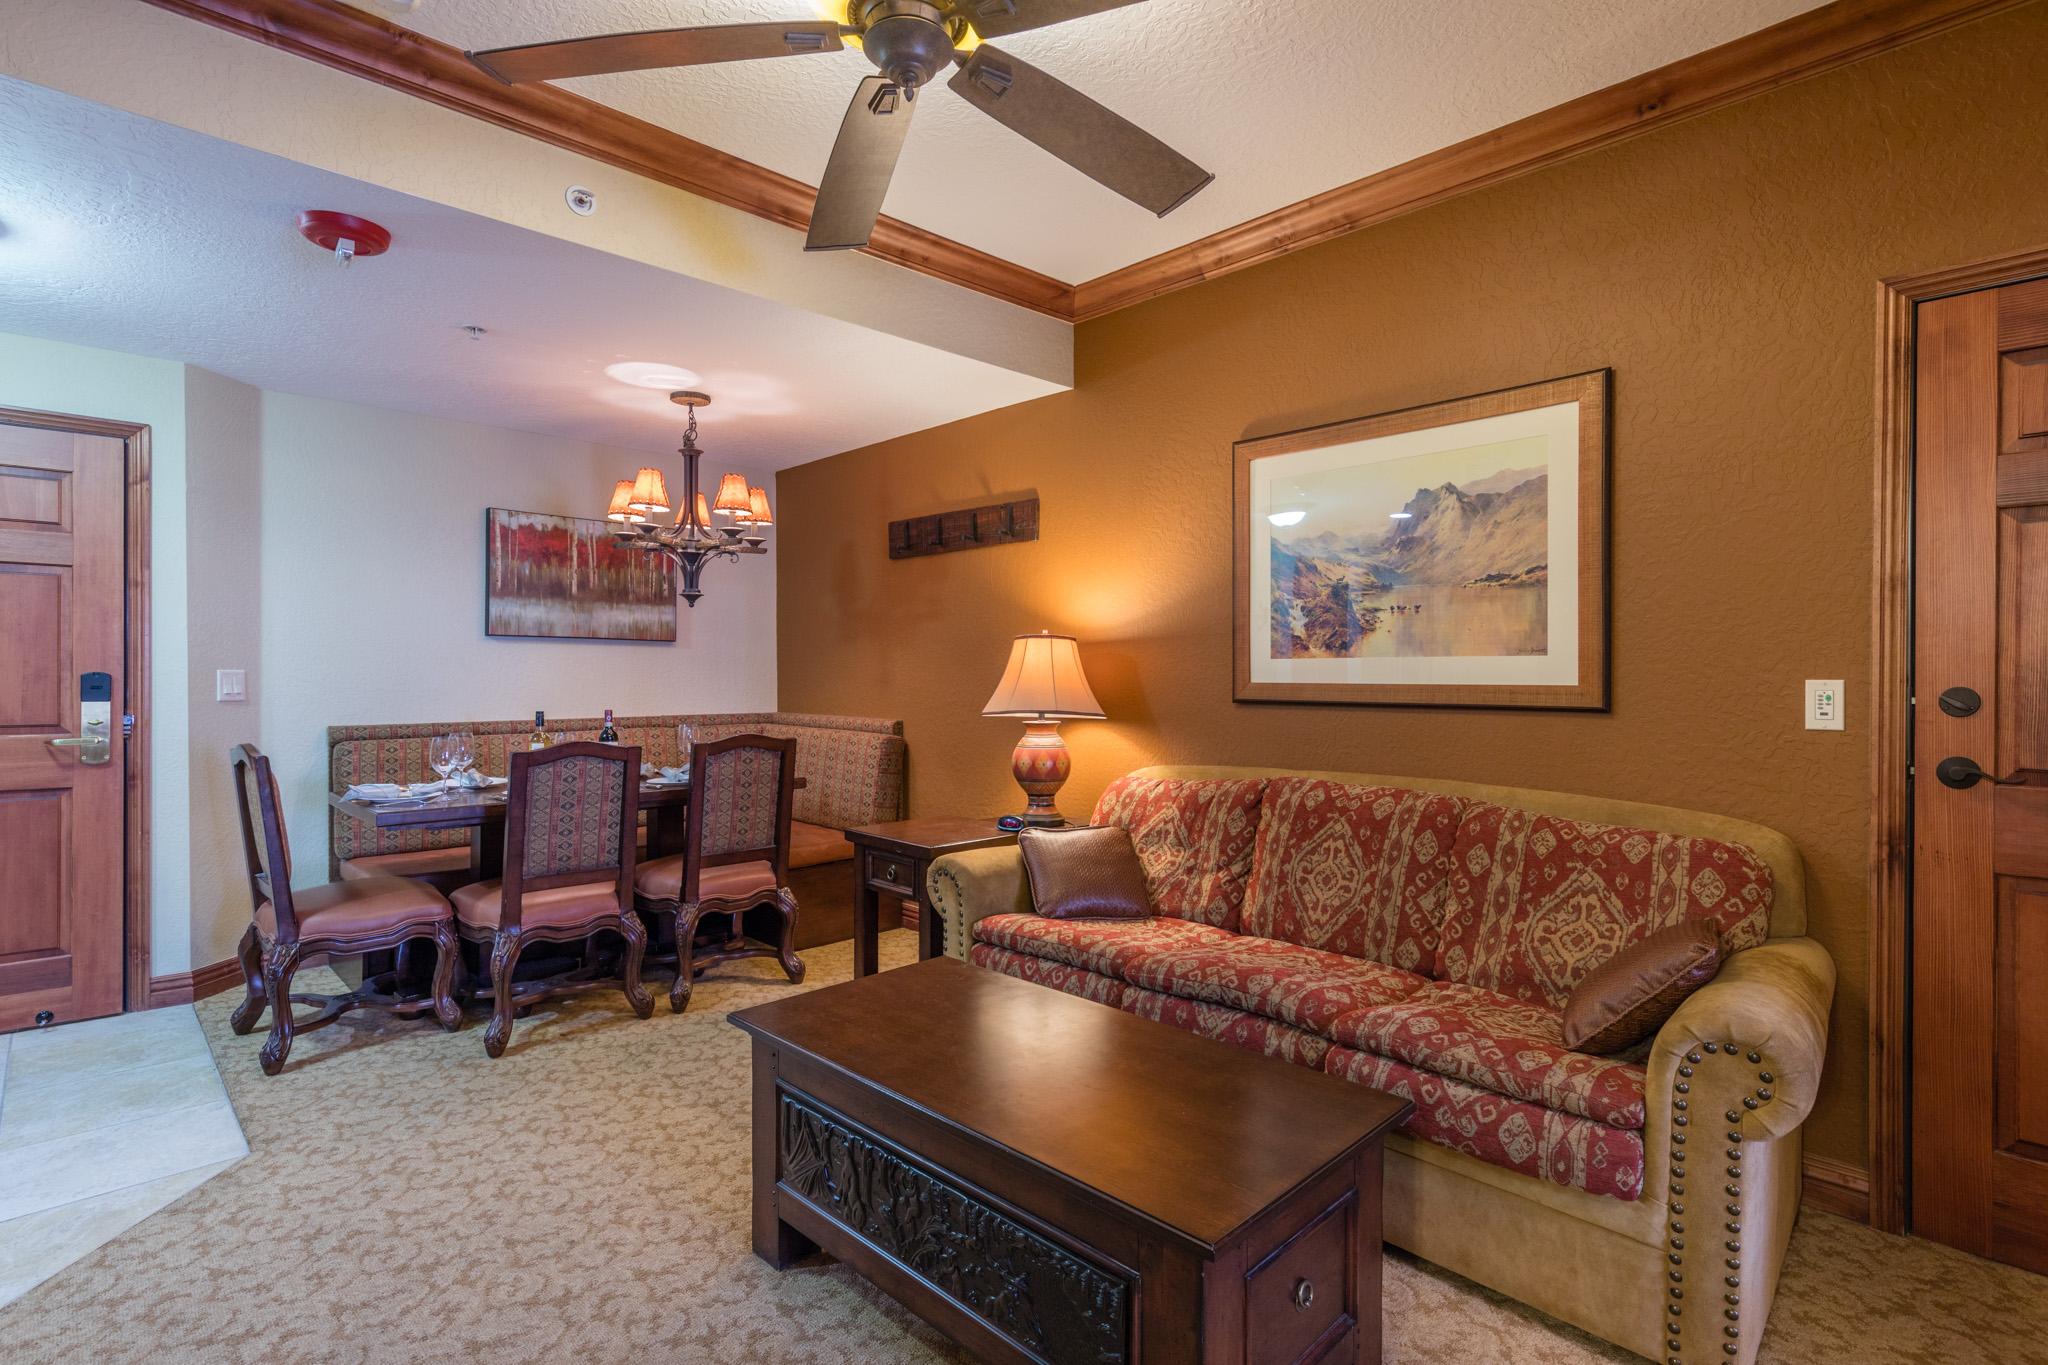 westgate resort mountain escape ovation vacation rentals